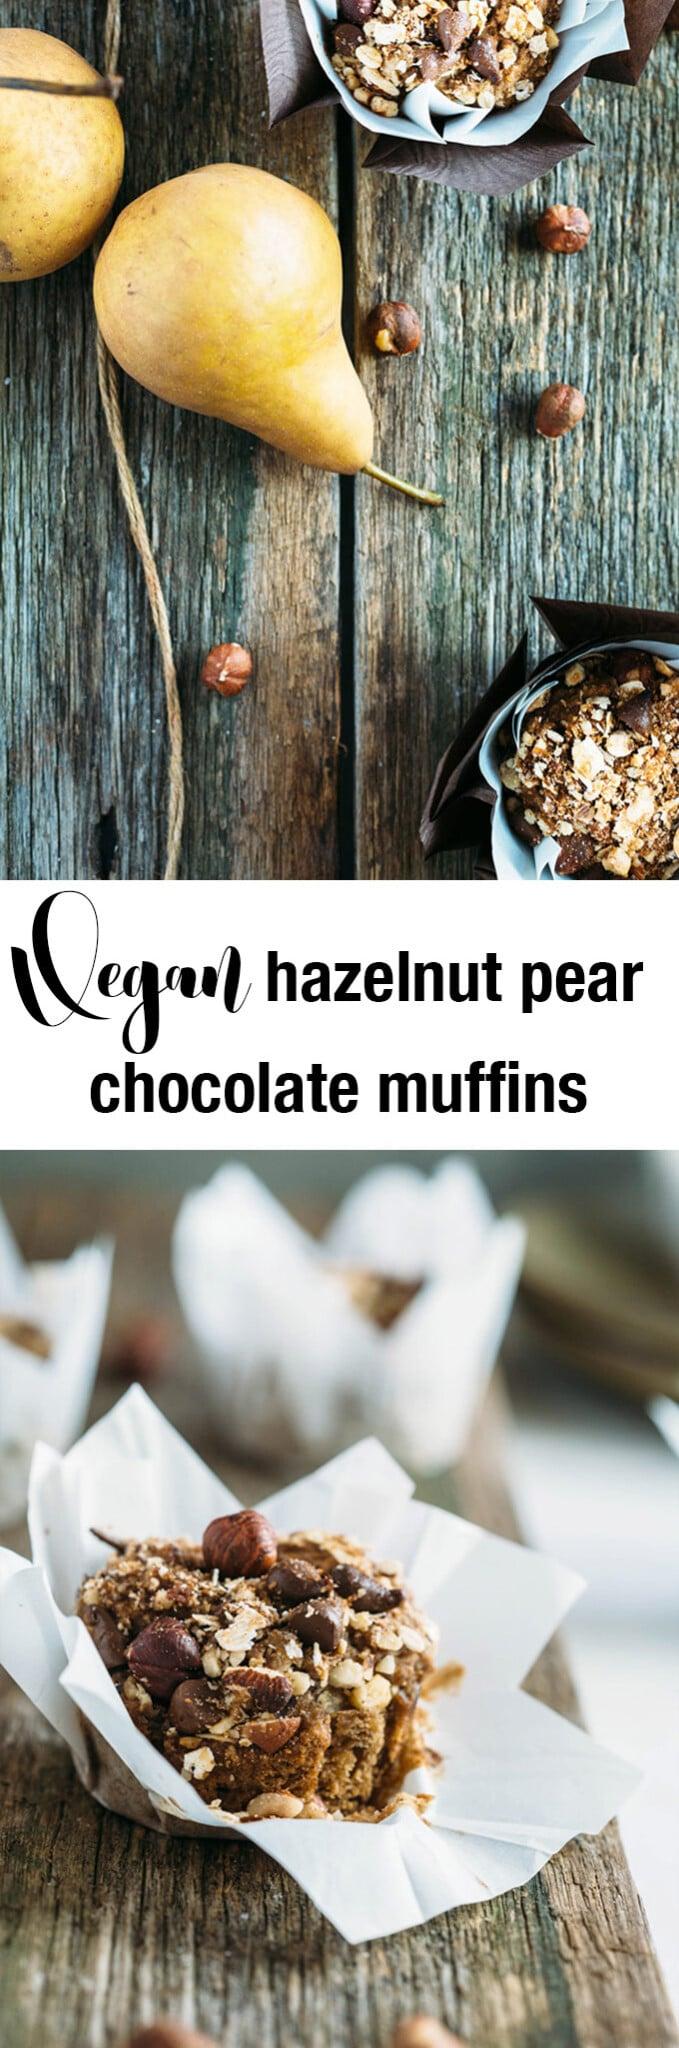 vegan-hazelnut-pear-chocolate-muffins-pin